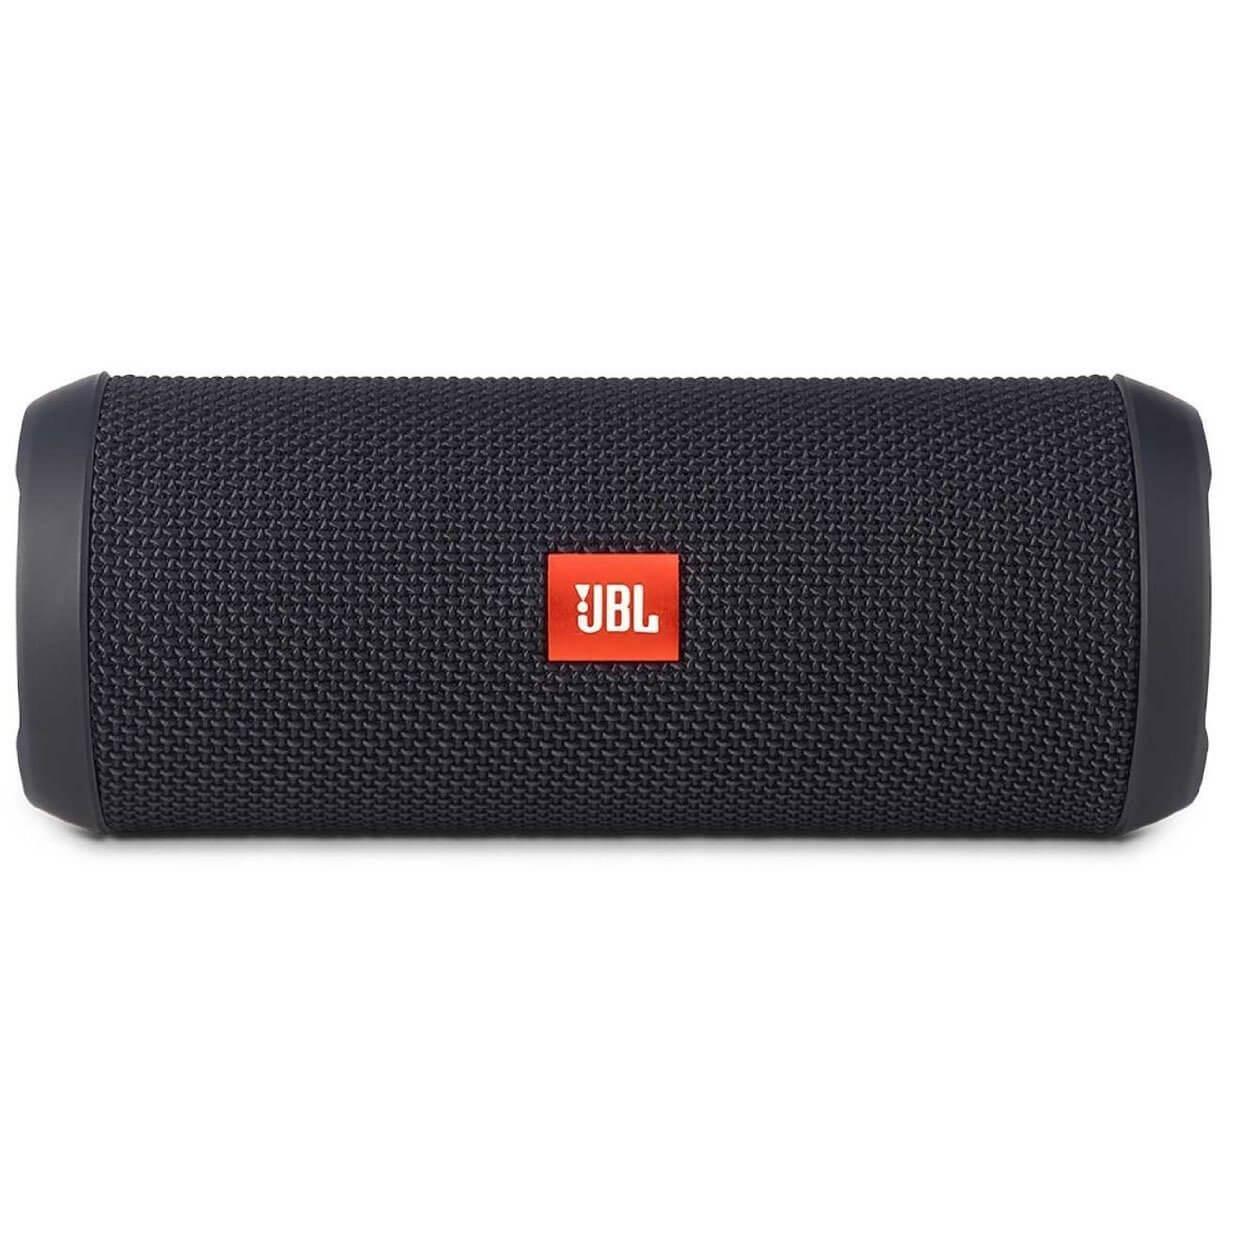 jbl-bluetooth-speakers-1